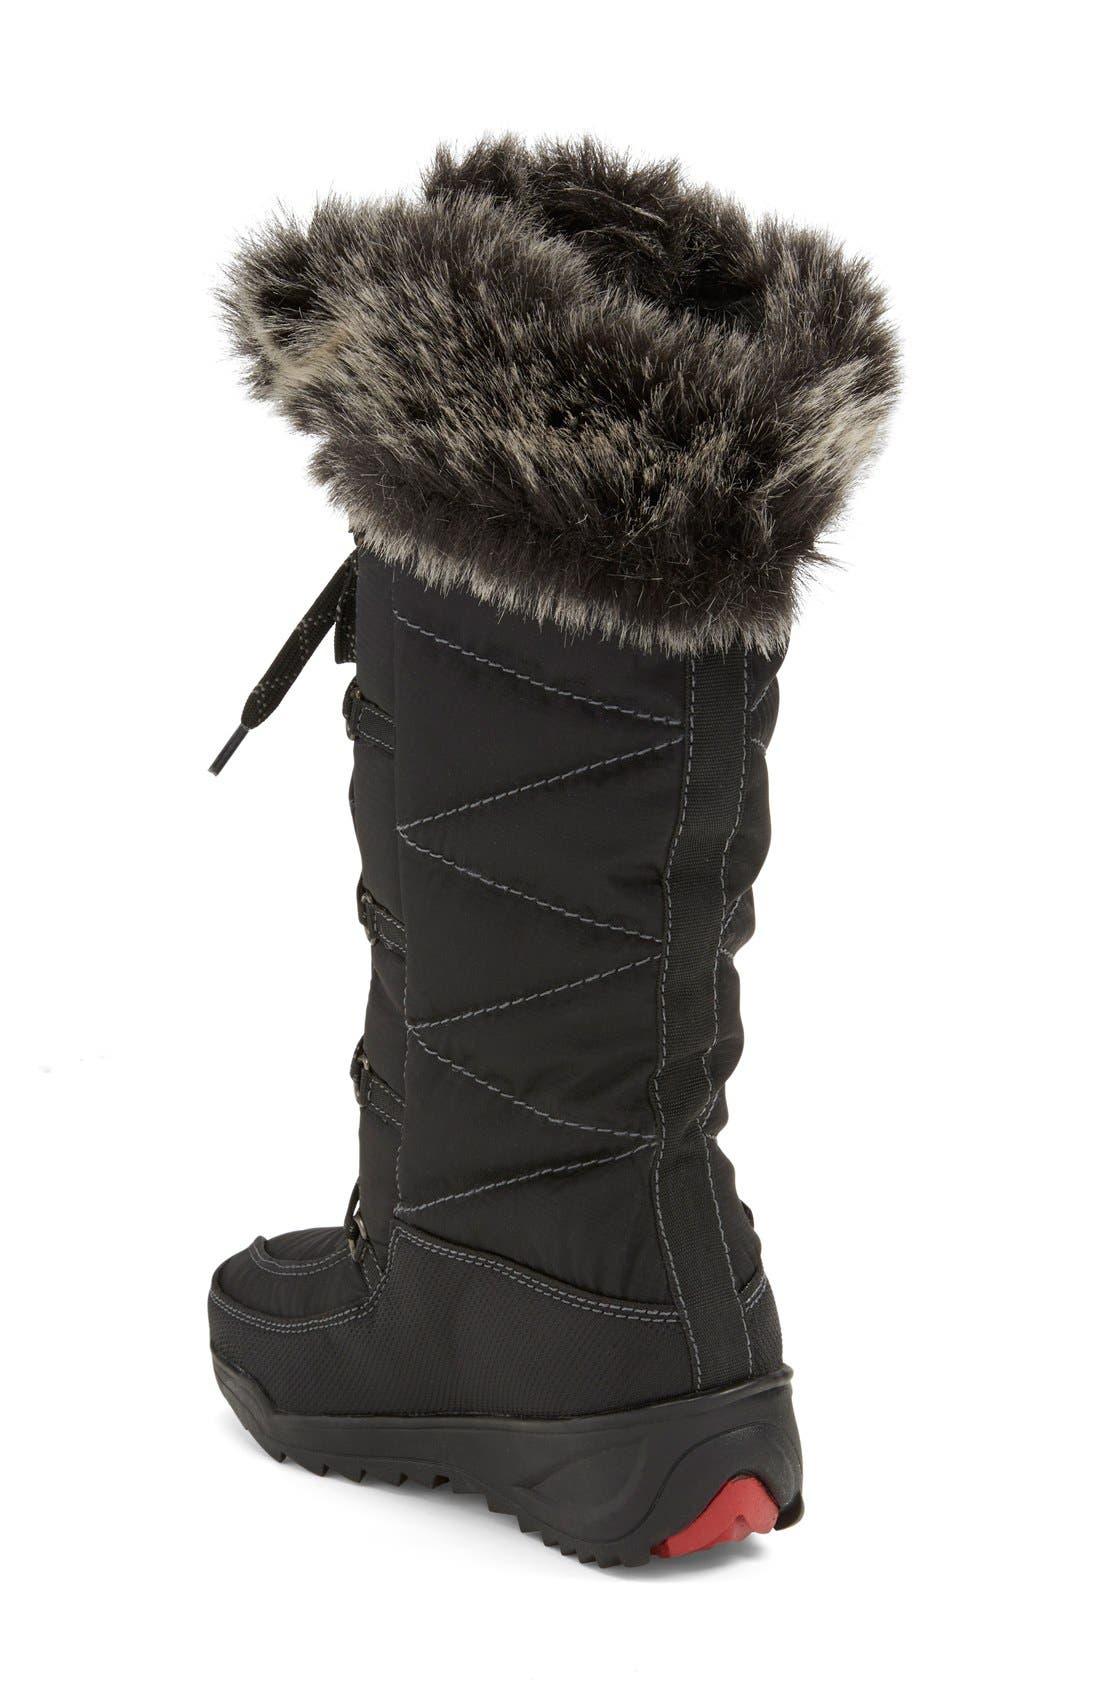 Alternate Image 2  - Kamik 'Porto' Waterproof Winter Boot (Women)